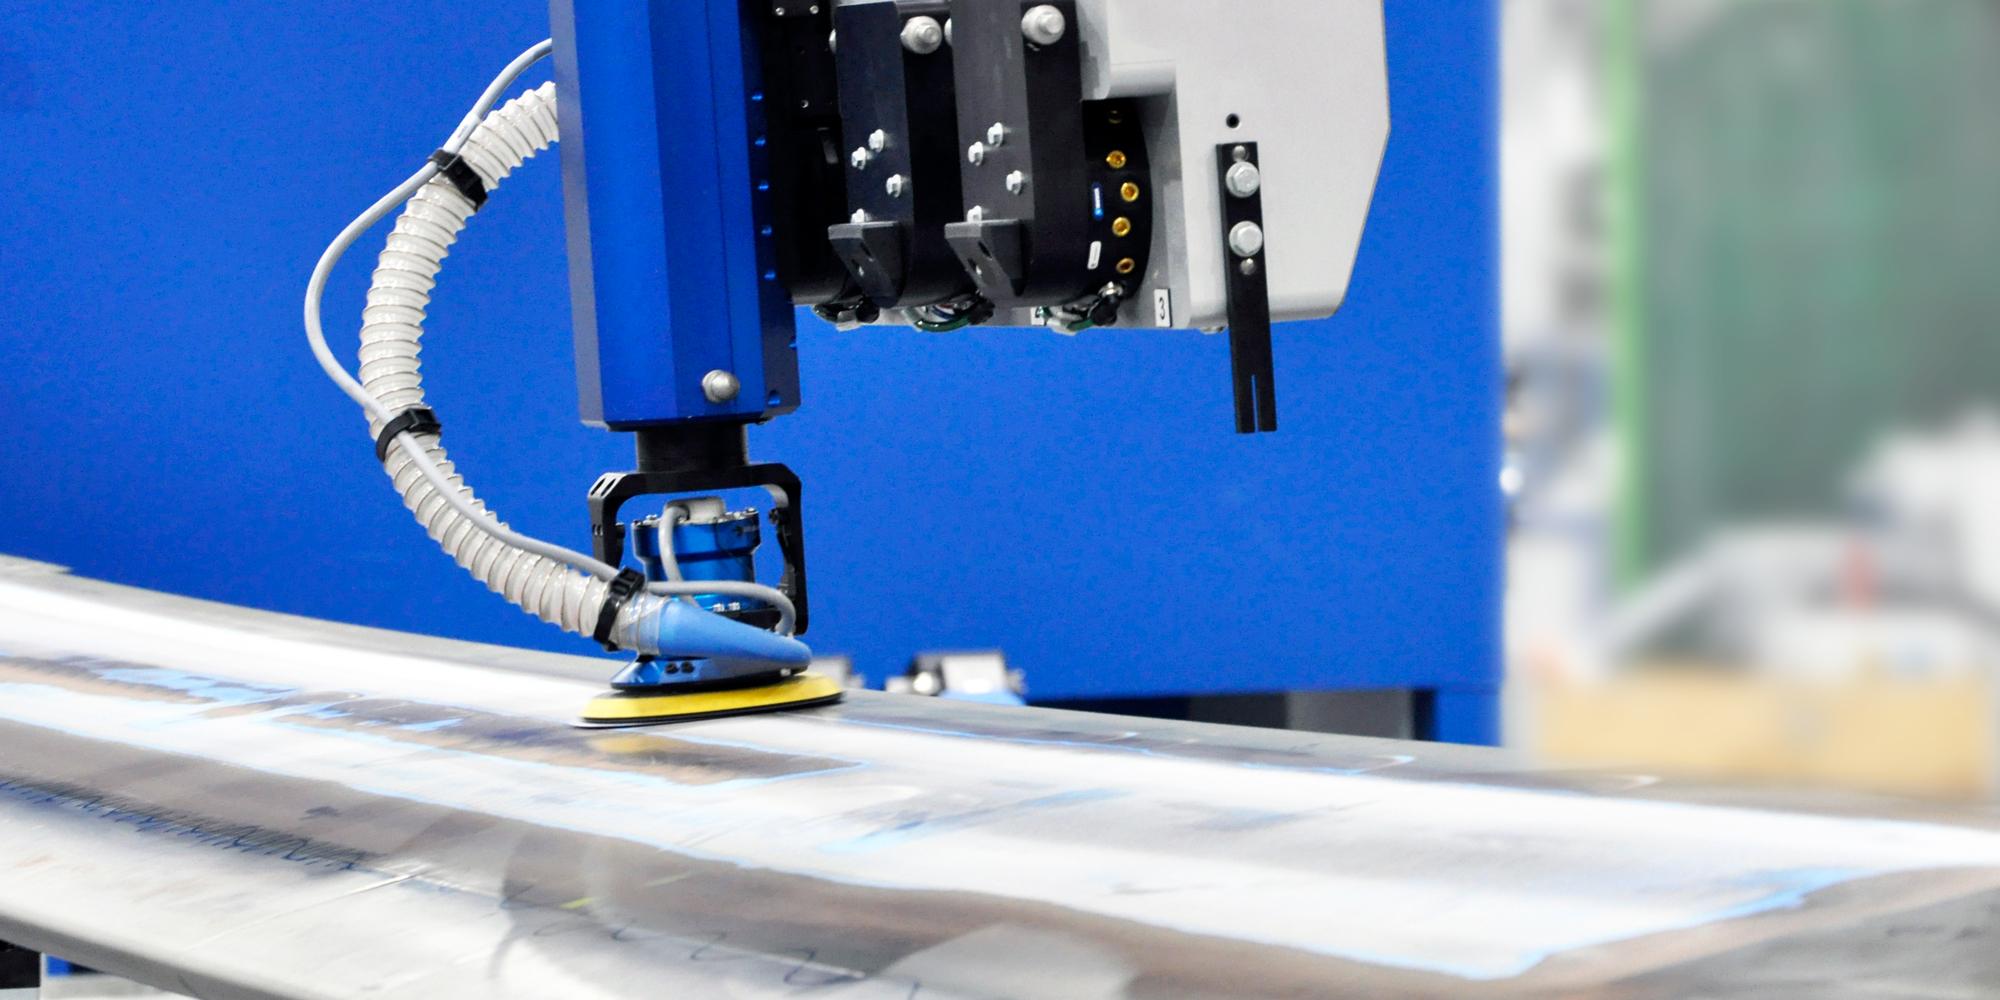 Robotic sanding & collaborative sanding - GEBE2